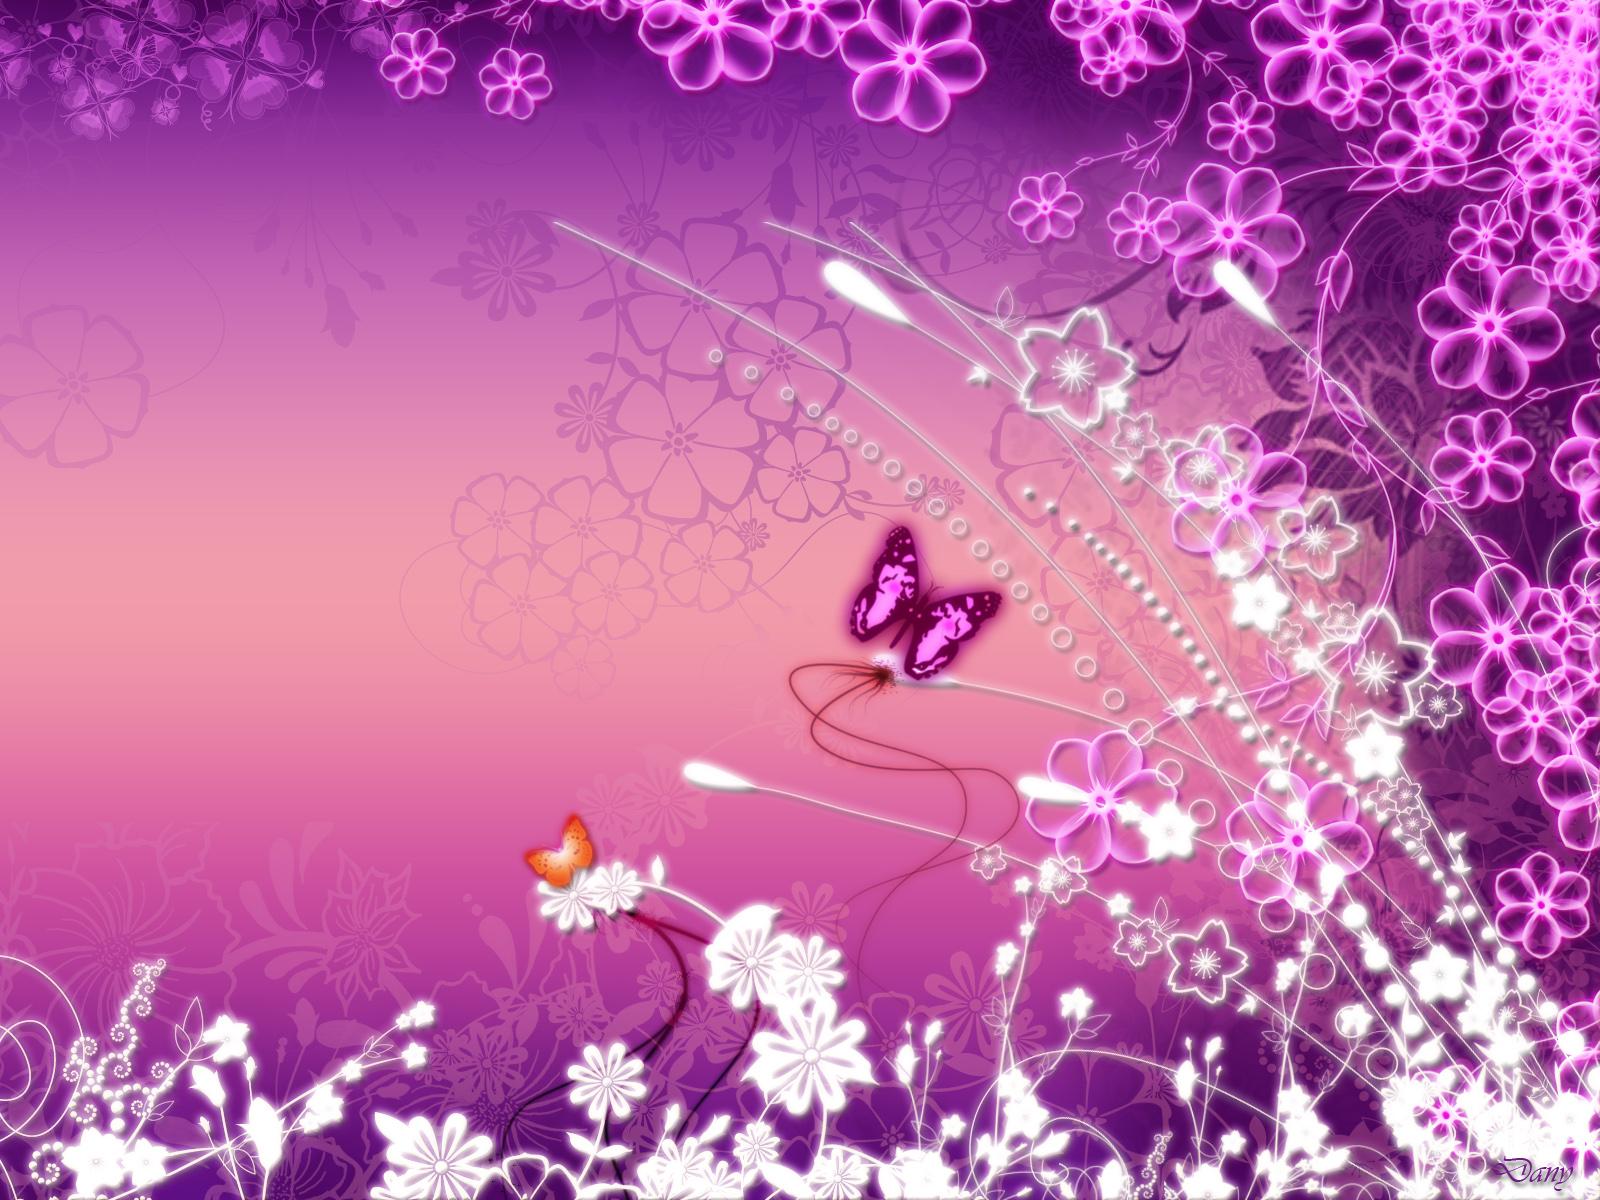 butterfly wallpaper Pink Butterfly Wallpaper 1600x1200